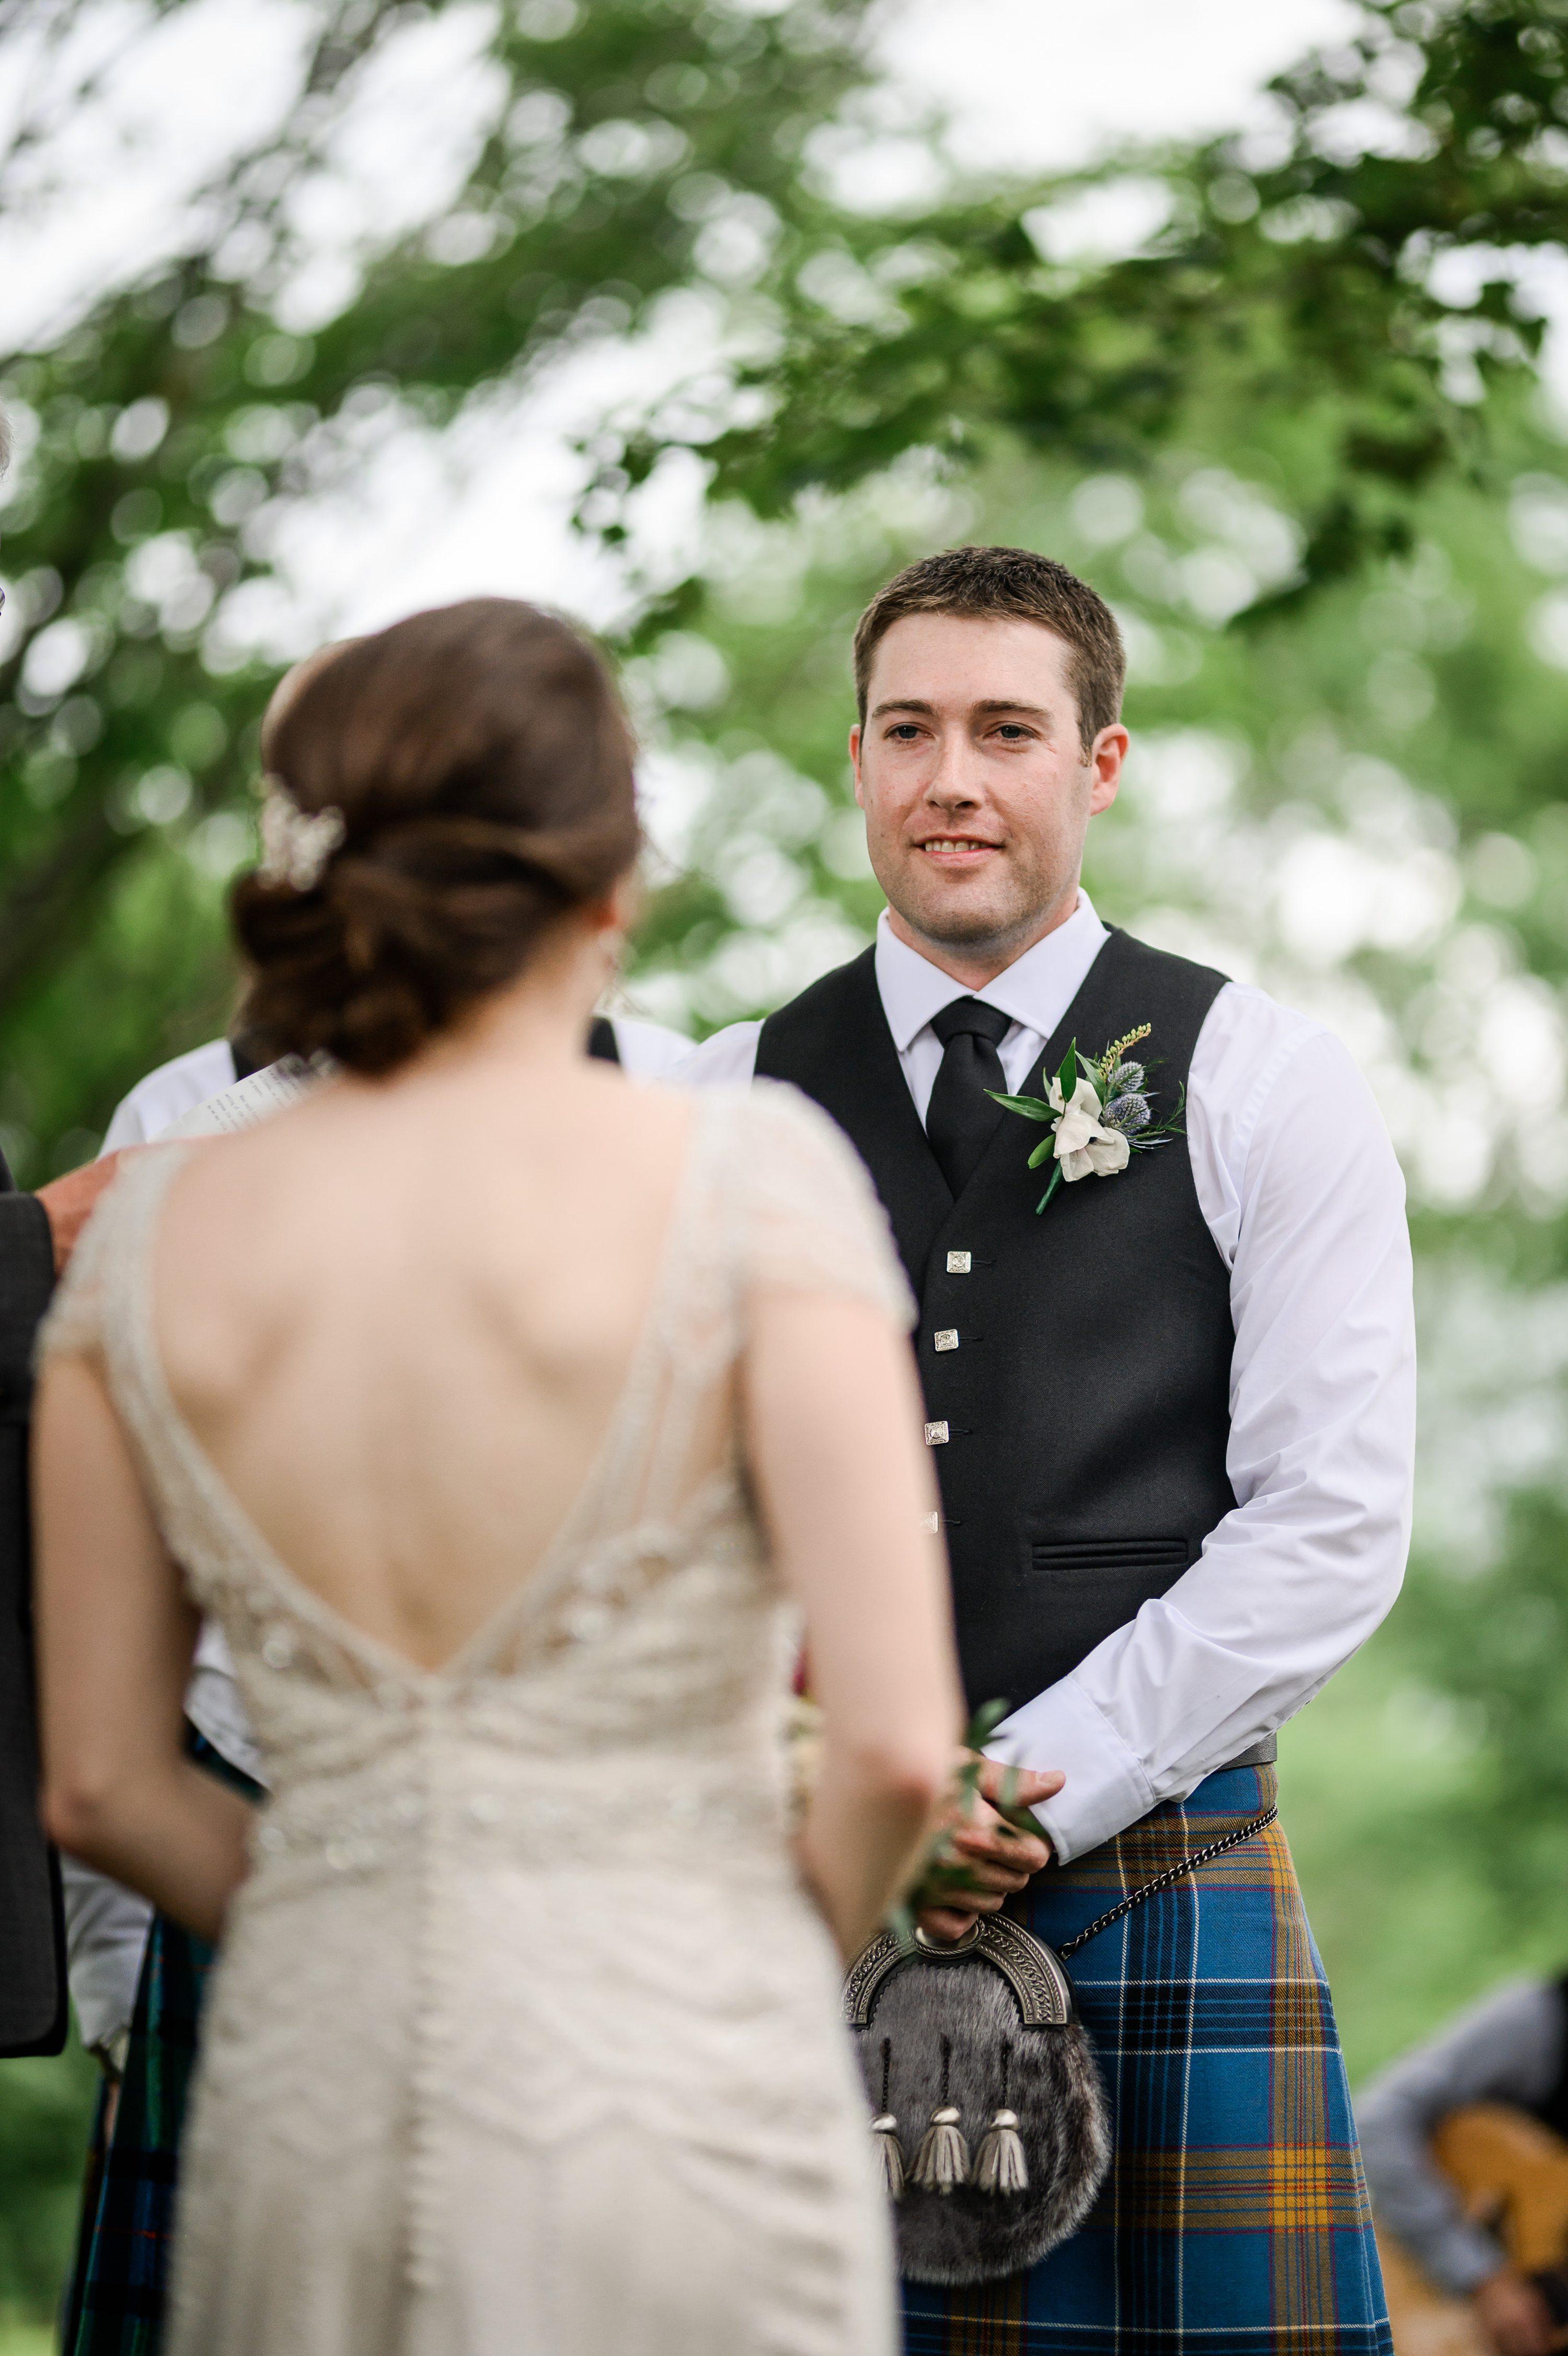 Mariage écossais, cornwall wedding